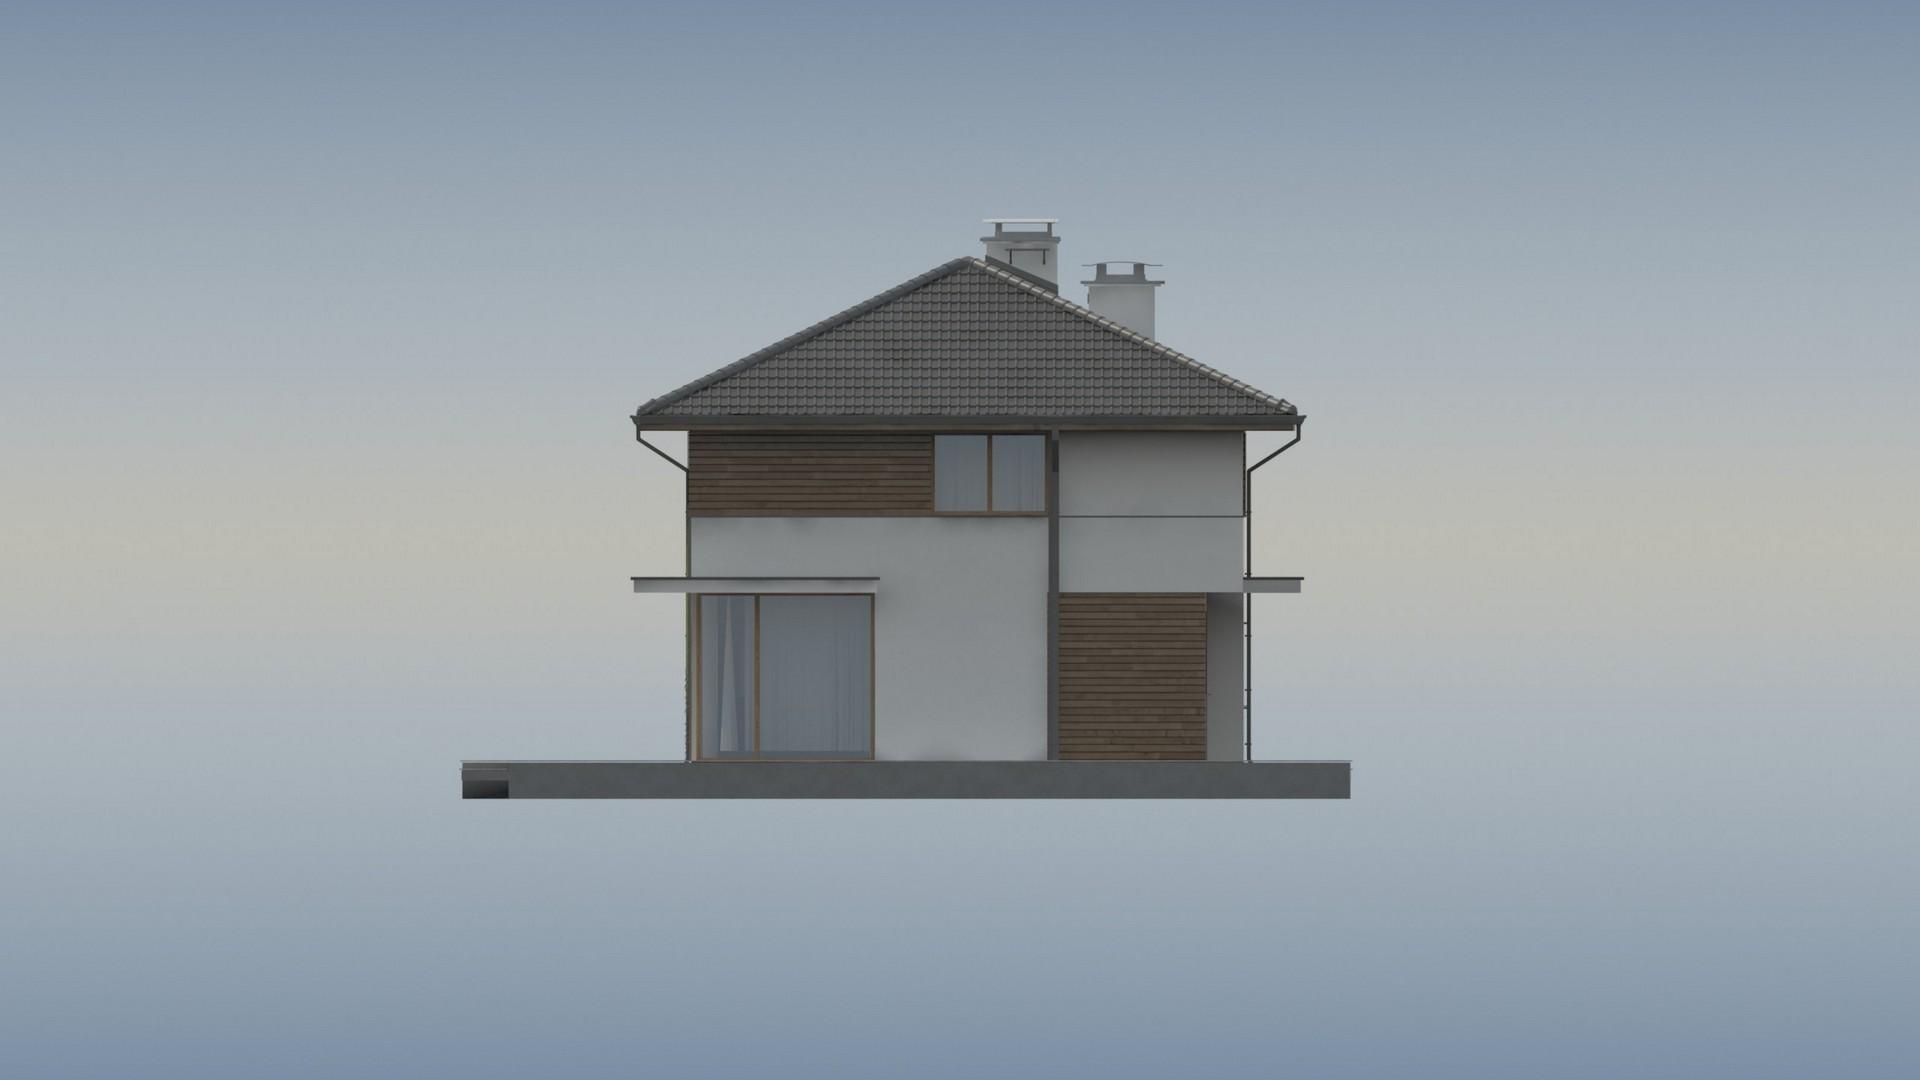 4m076 фасад